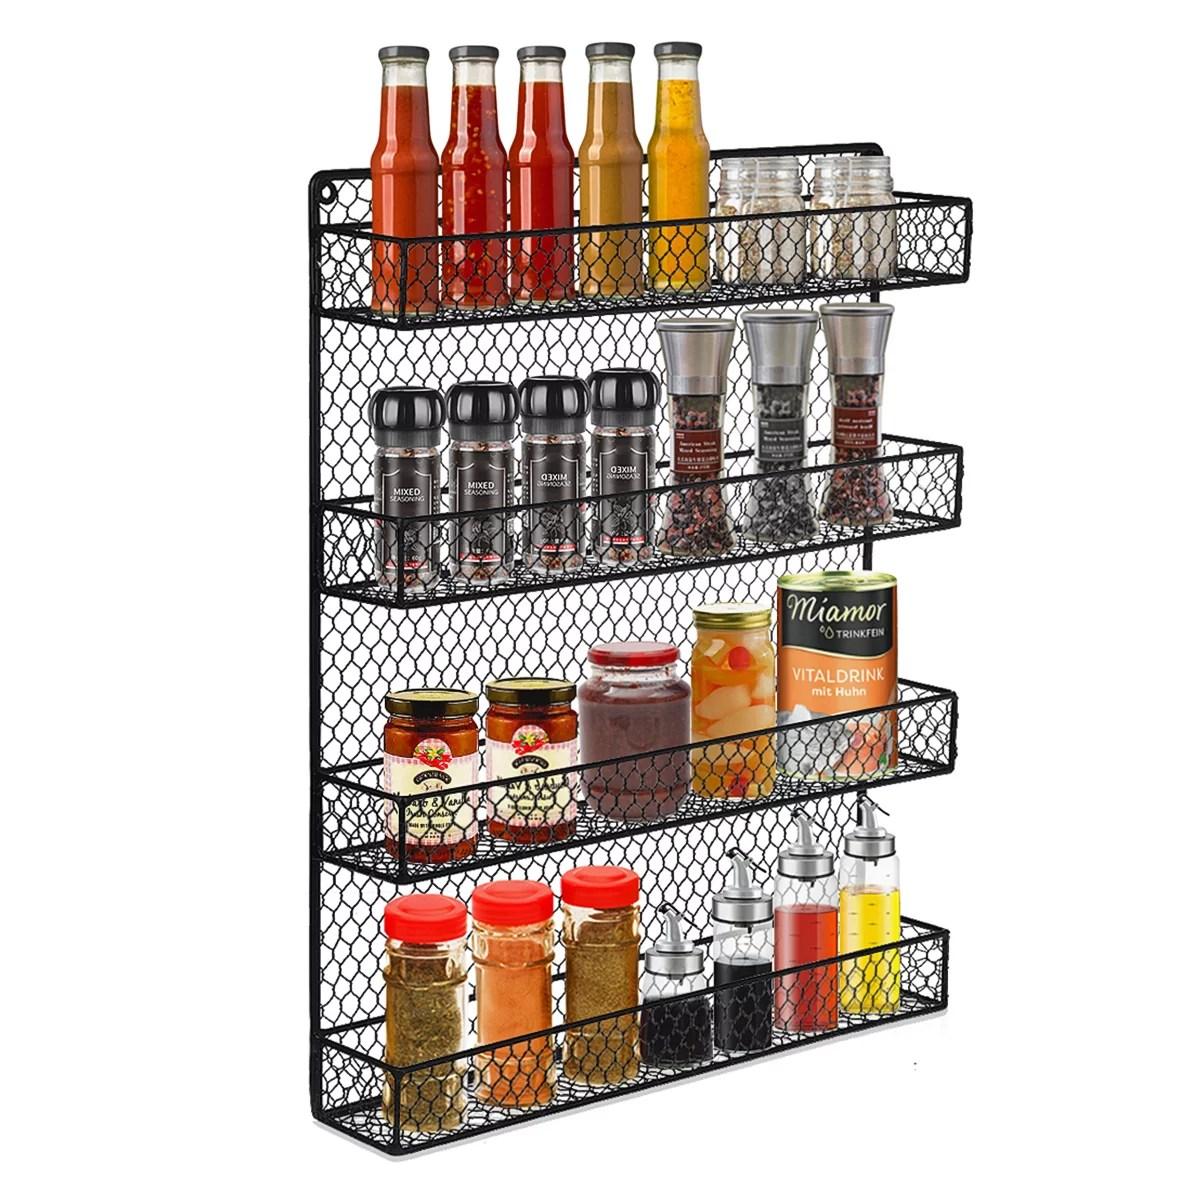 2tier spice rack kitchen organization and countertop storage spice organizer wire rack rustic chicken spice rack spice bottle storage rack jar bottle